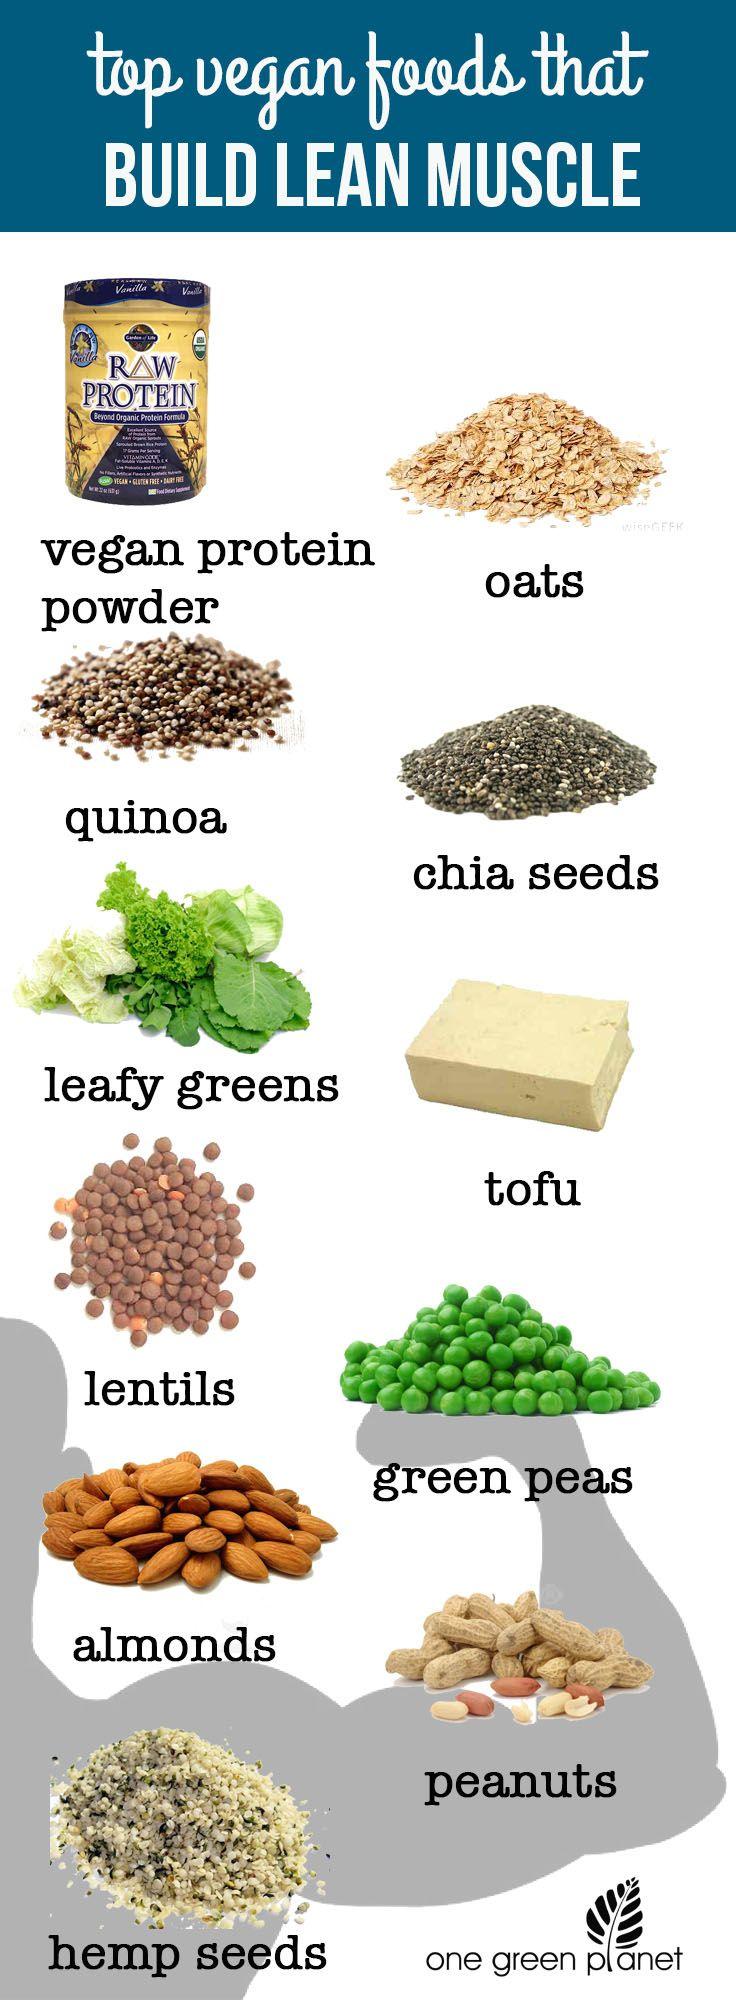 Top Vegan Foods That Build Lean Muscle http://onegr.pl/1rRlZJO #vegan #plantpowered #plantstrong